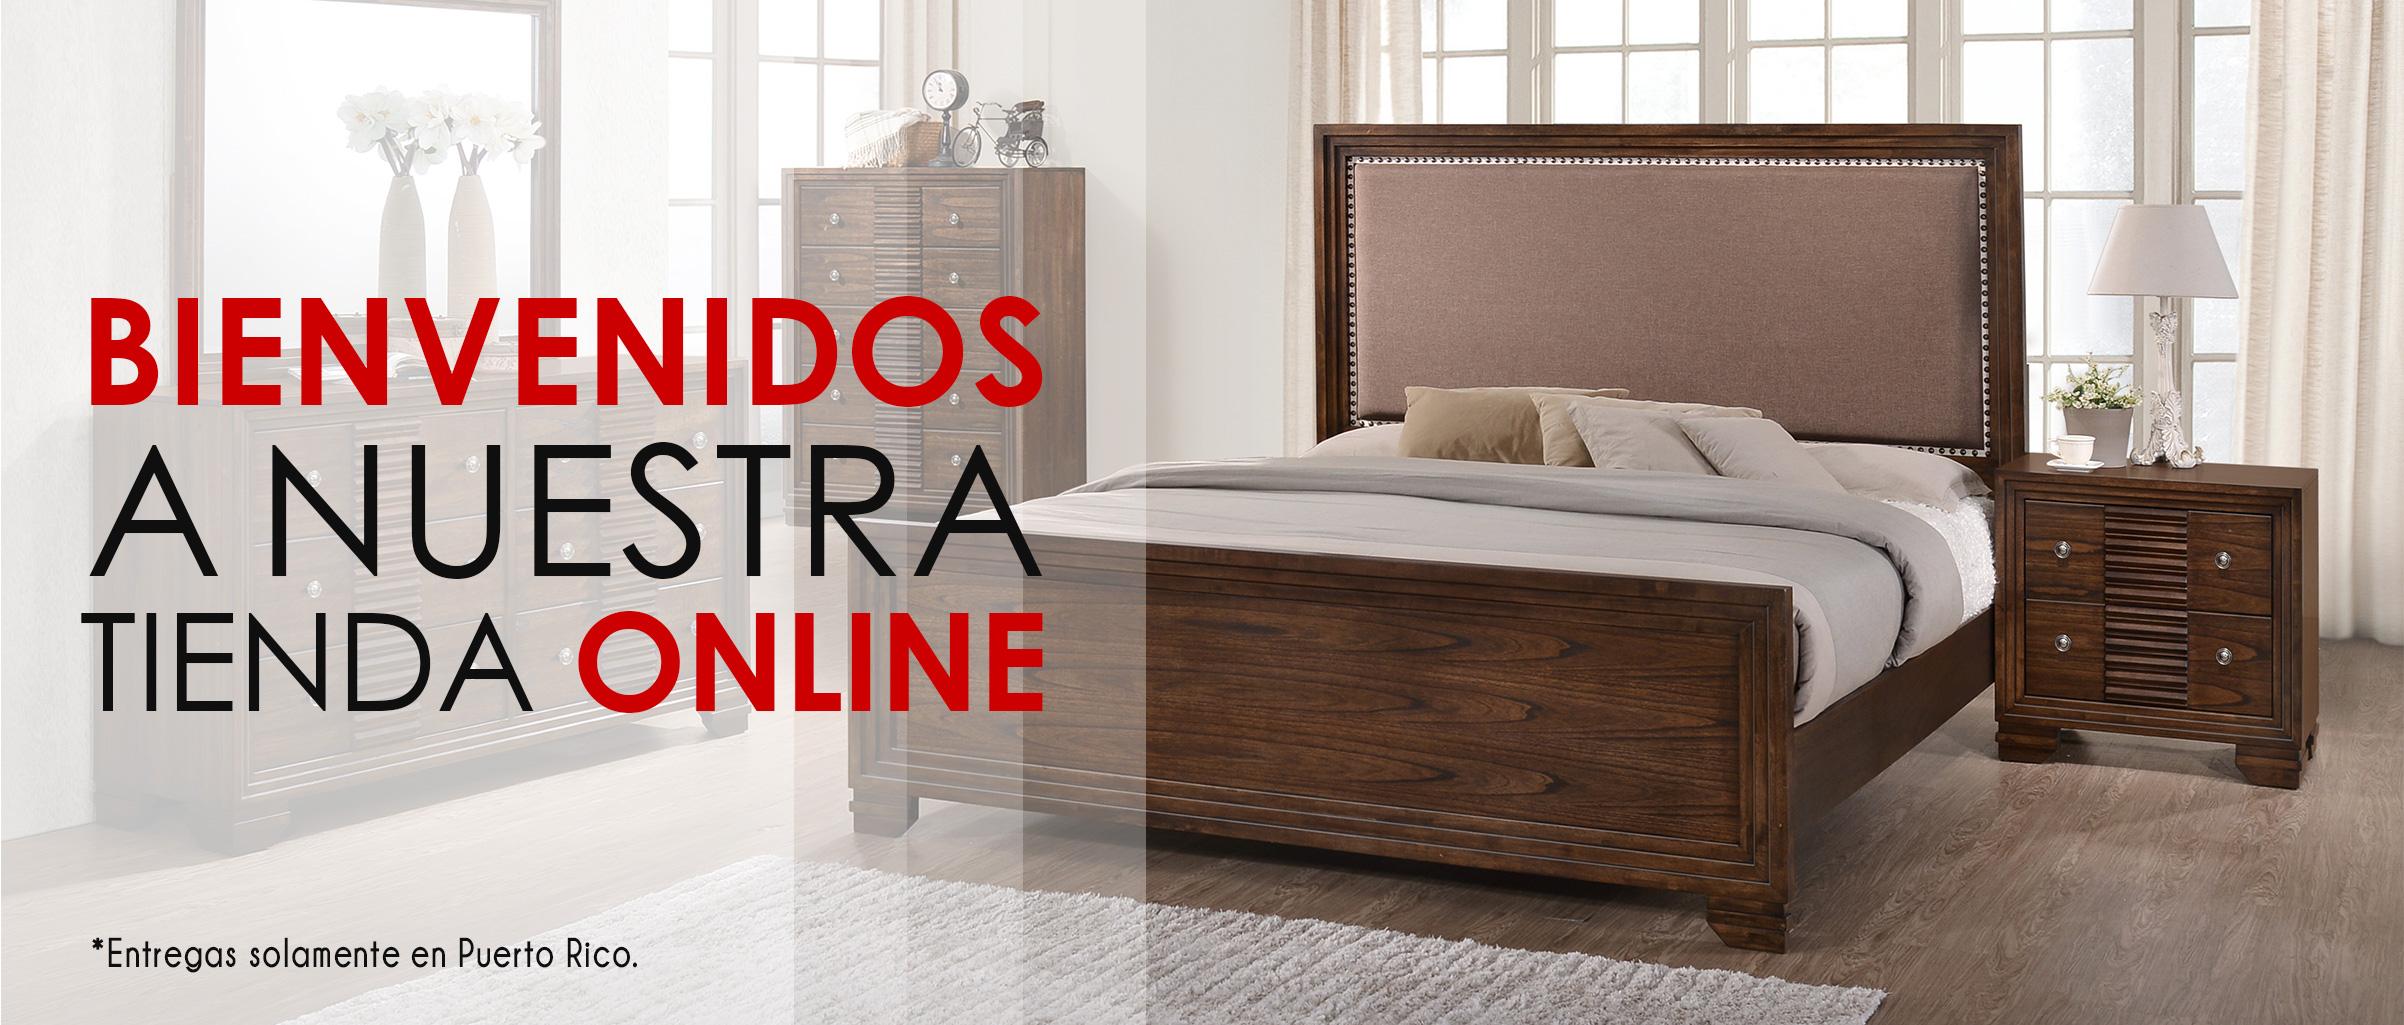 Puerto Rico Furniture Stores Home Design Ideas And Pictures # Muebles Berrios Pr